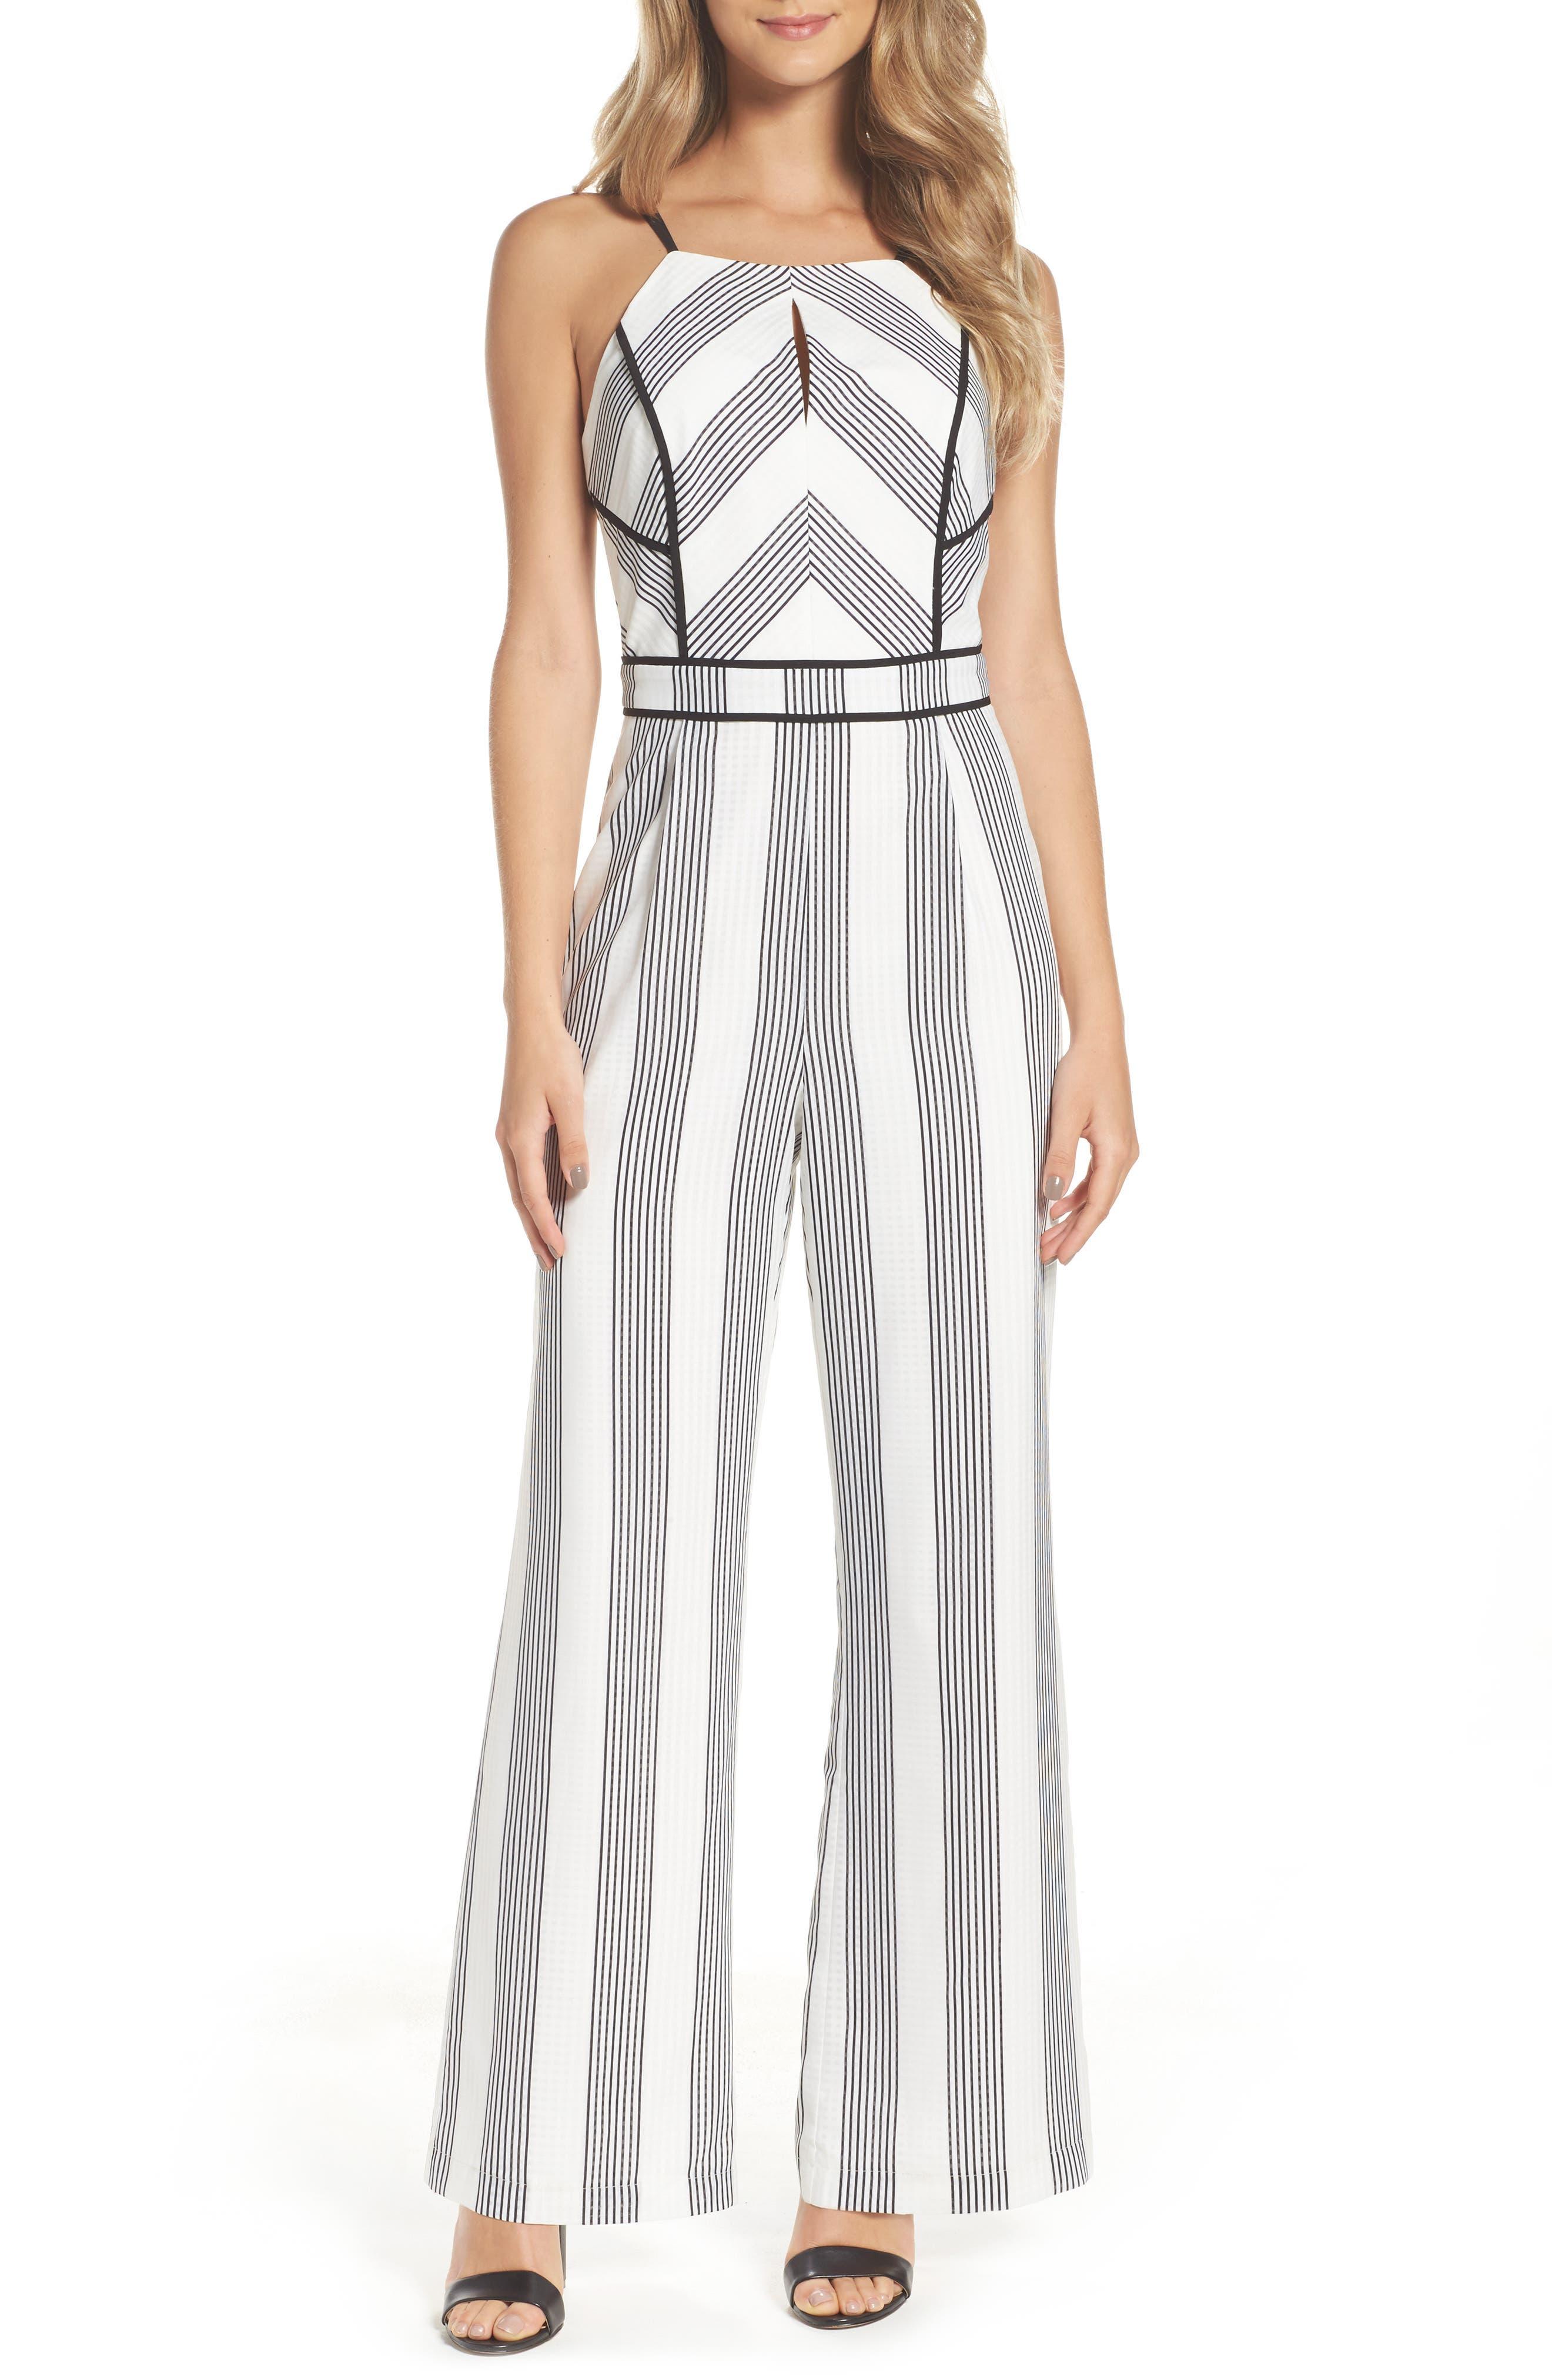 Adelyn Rae Vidette Stripe Jumpsuit